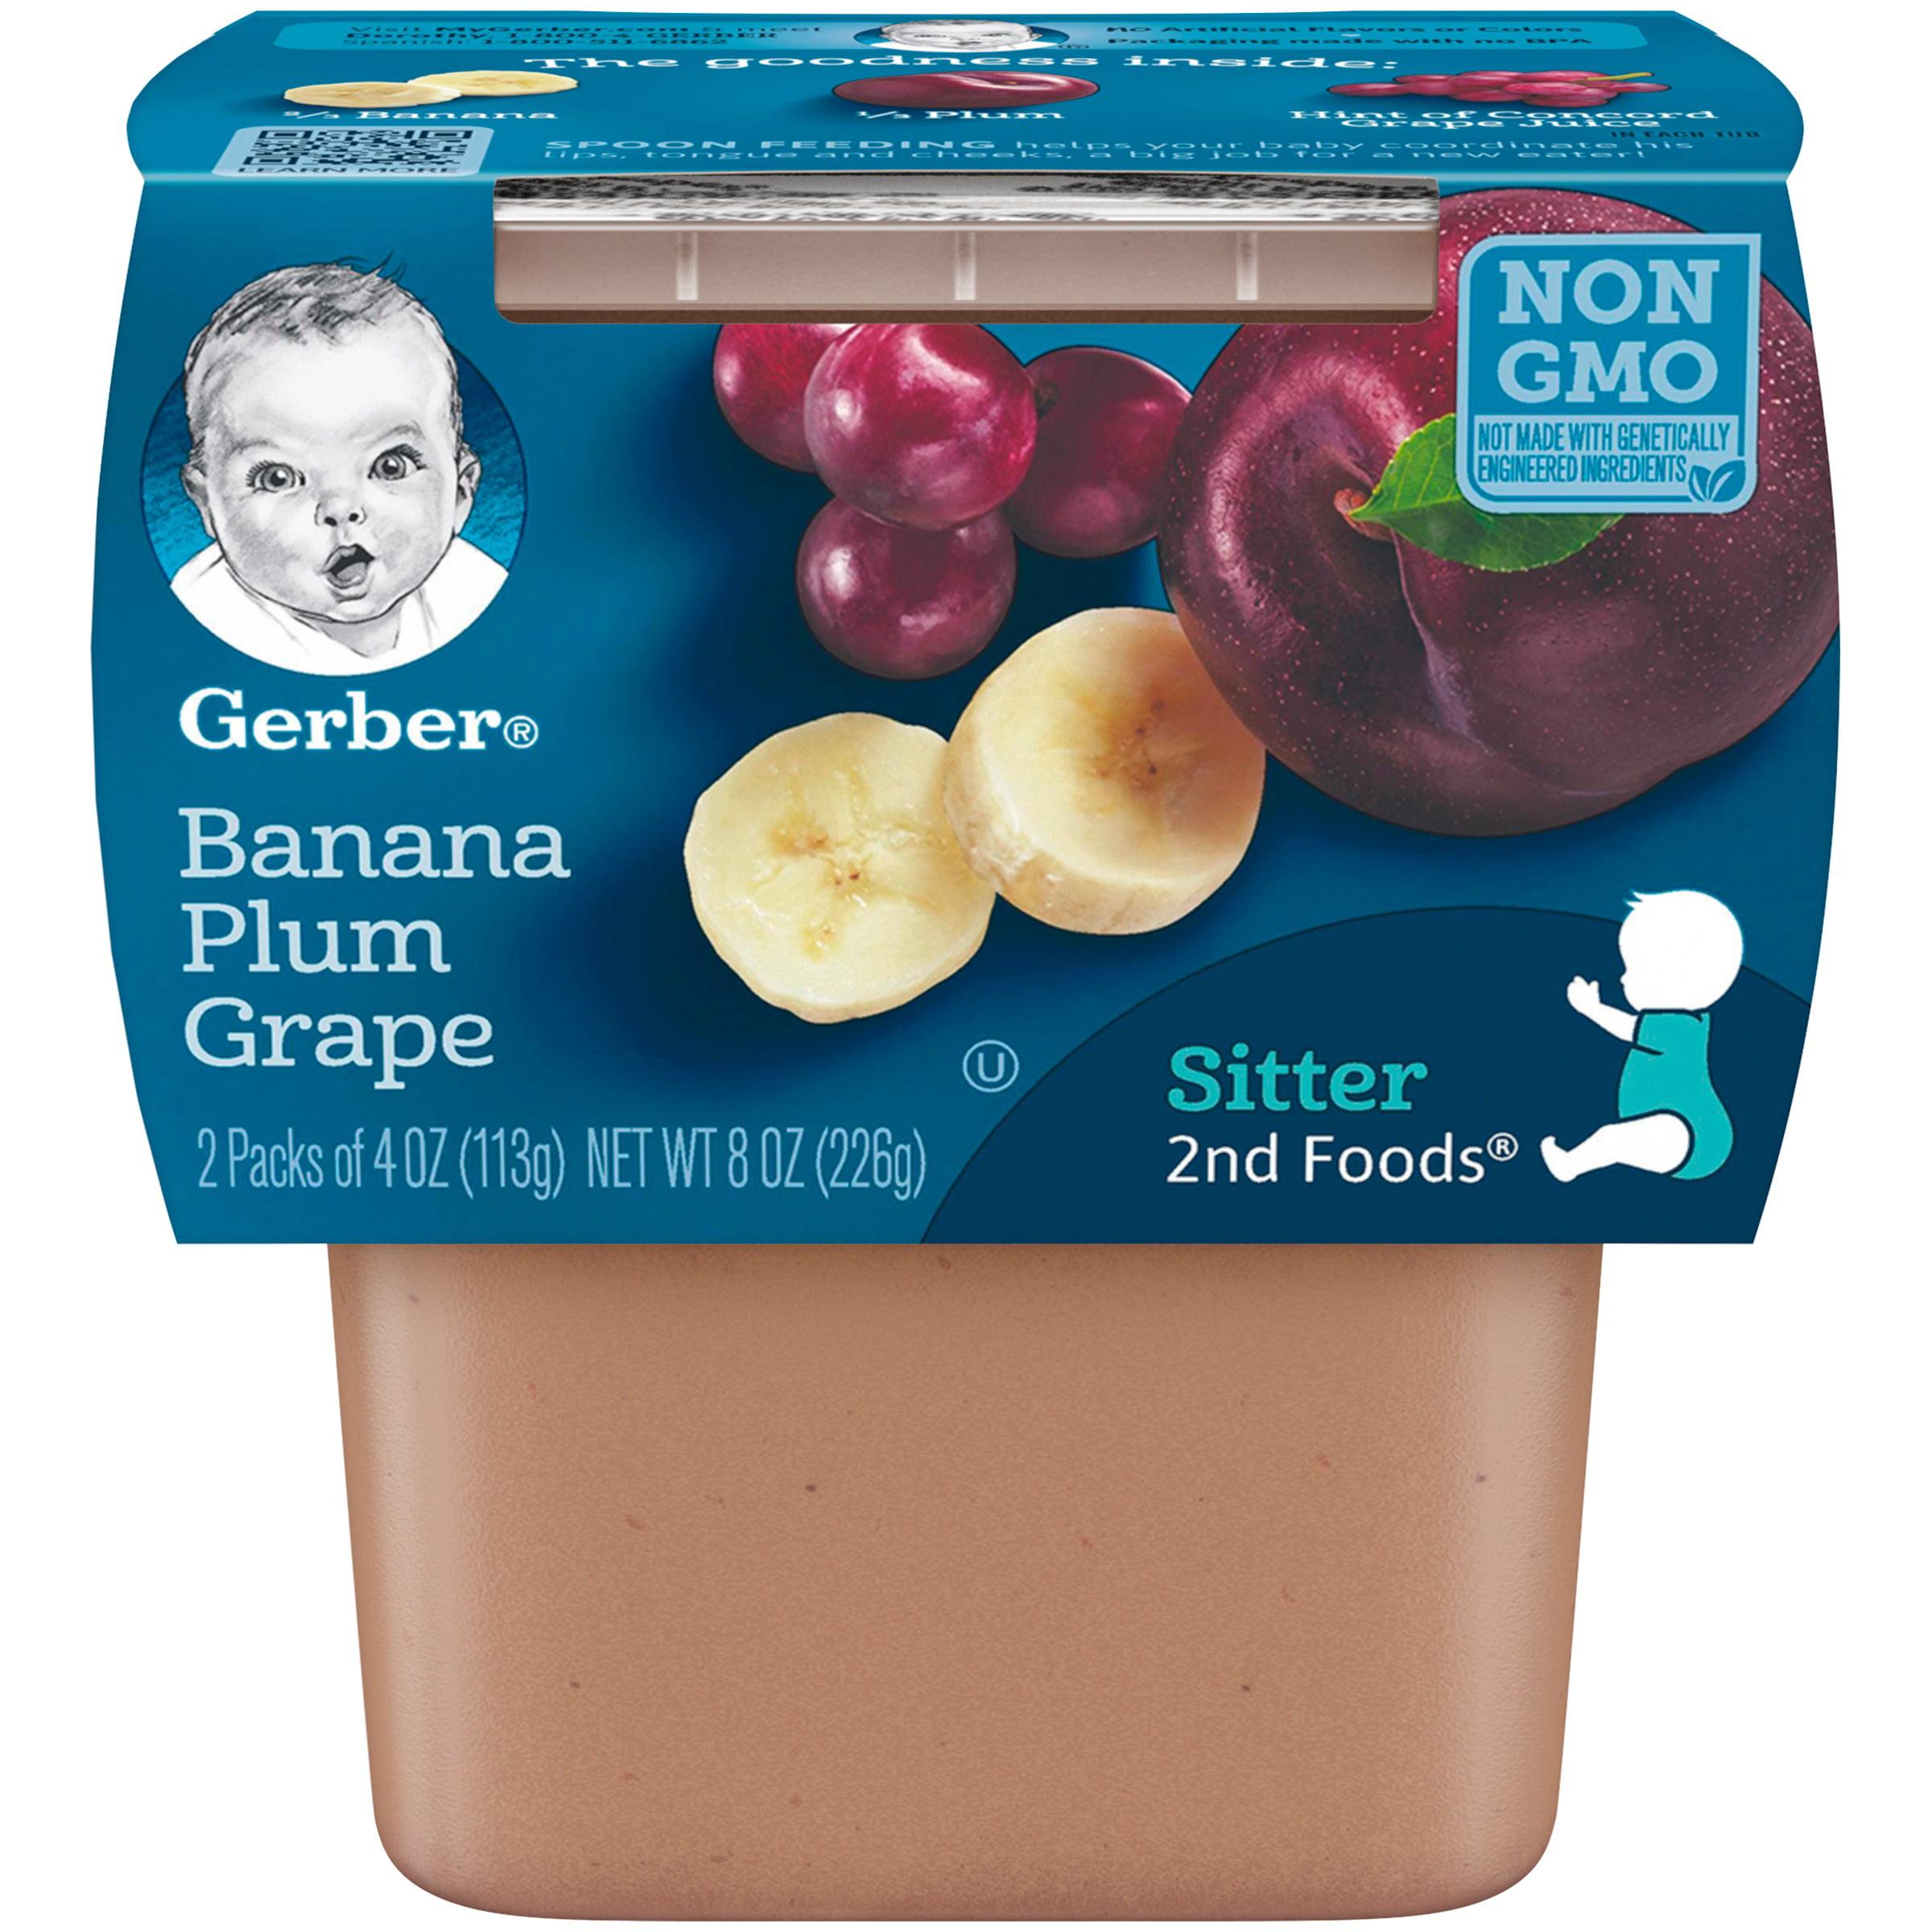 Gerber 2nd Foods Banana Plum Grape Baby Food, 4 oz. Tubs, 2 Count (Pack of 8) by Gerber